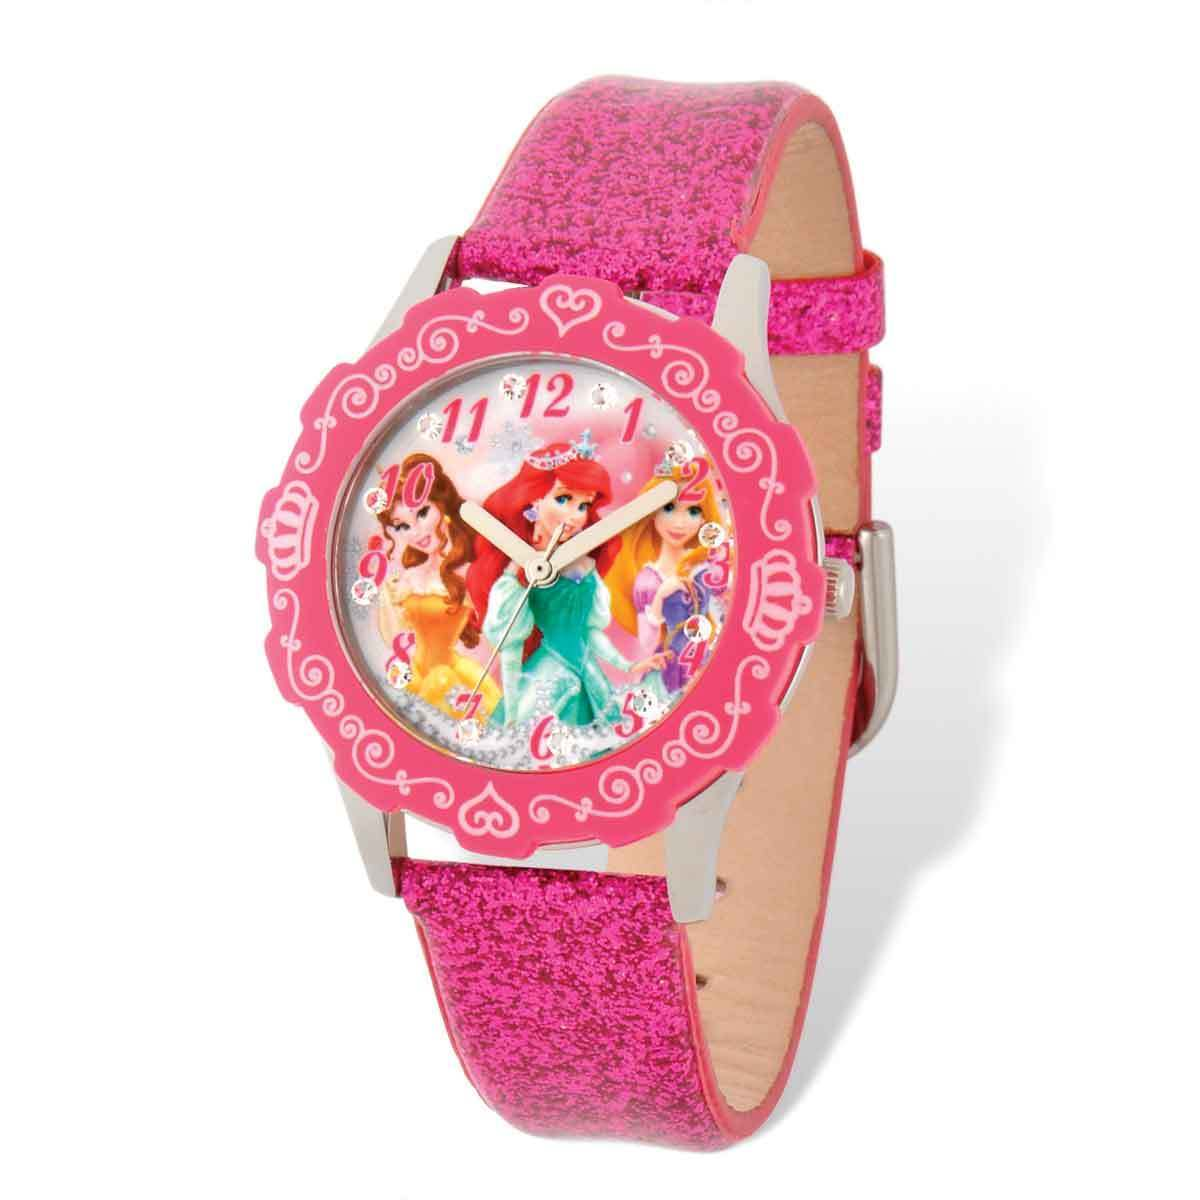 Shop Disney Princess Belle/Ariel/Rapunzel Pink Leather Tween Watch ...